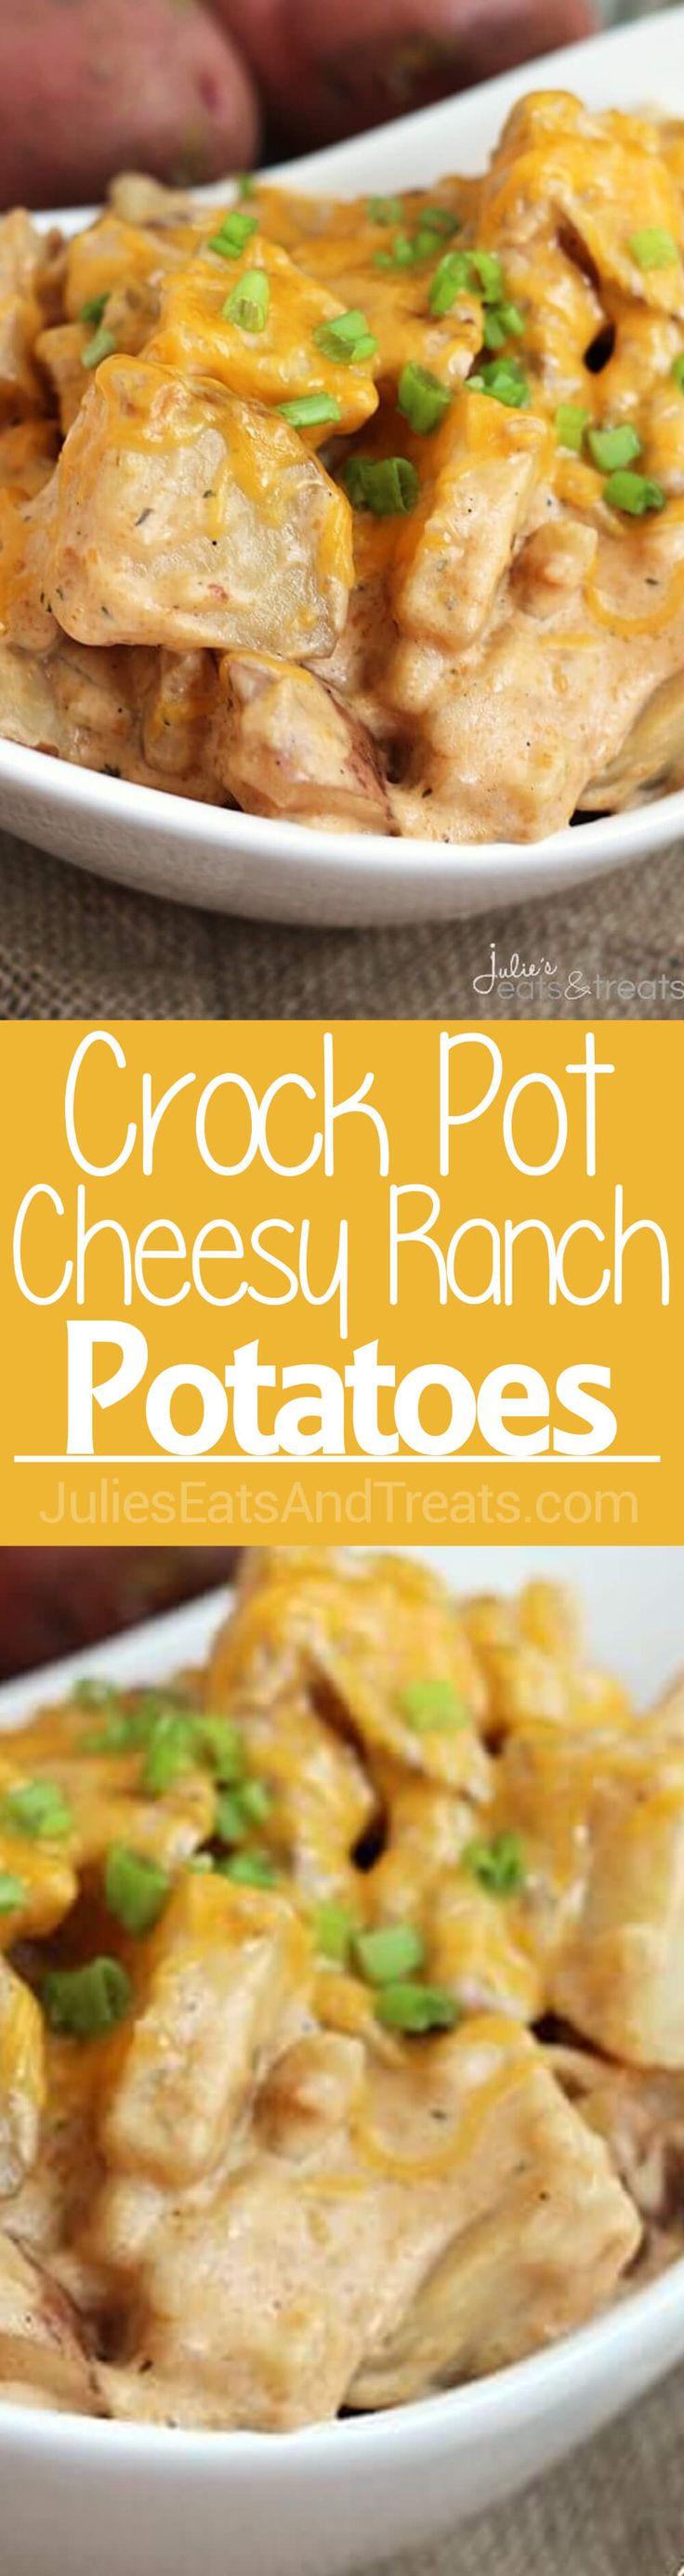 Crock Pot Cheesy Ranch Potatoes ~ Super Easy, Cheesy Crock Pot Potatoes Loaded with Ranch! via @julieseats